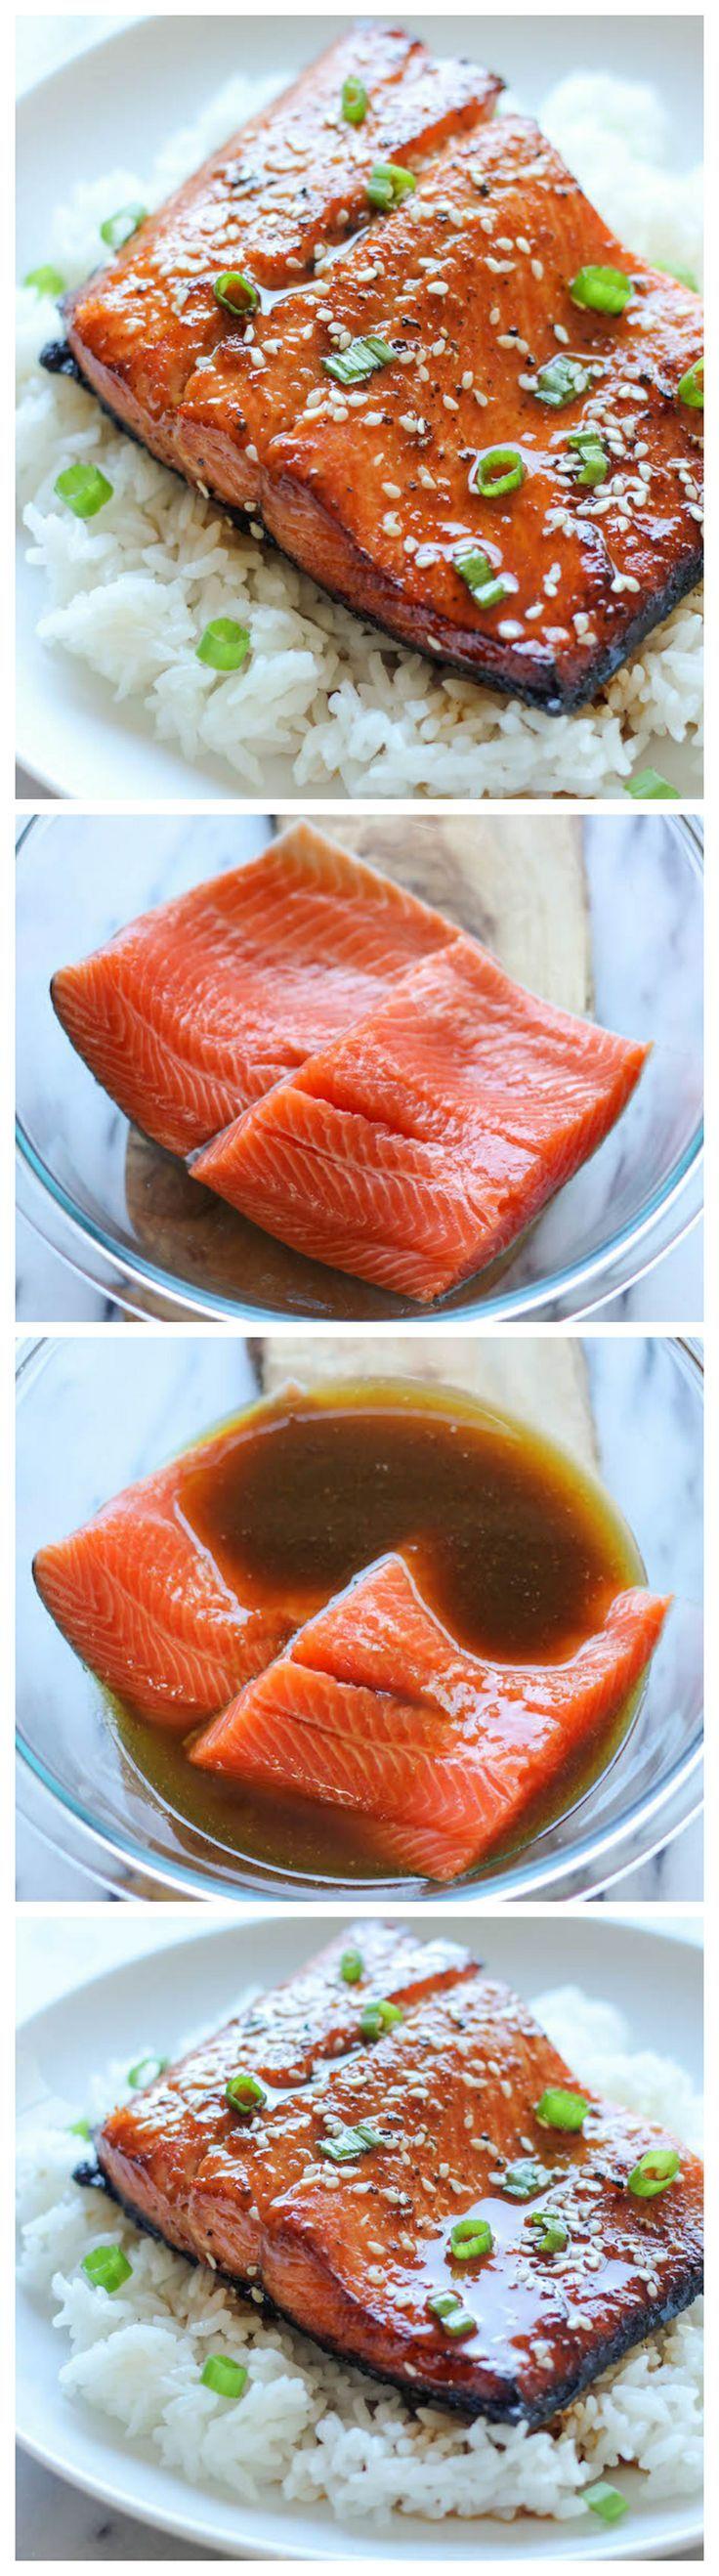 100+ Grilled Salmon Recipes on Pinterest | Grilled Salmon, Salmon ...